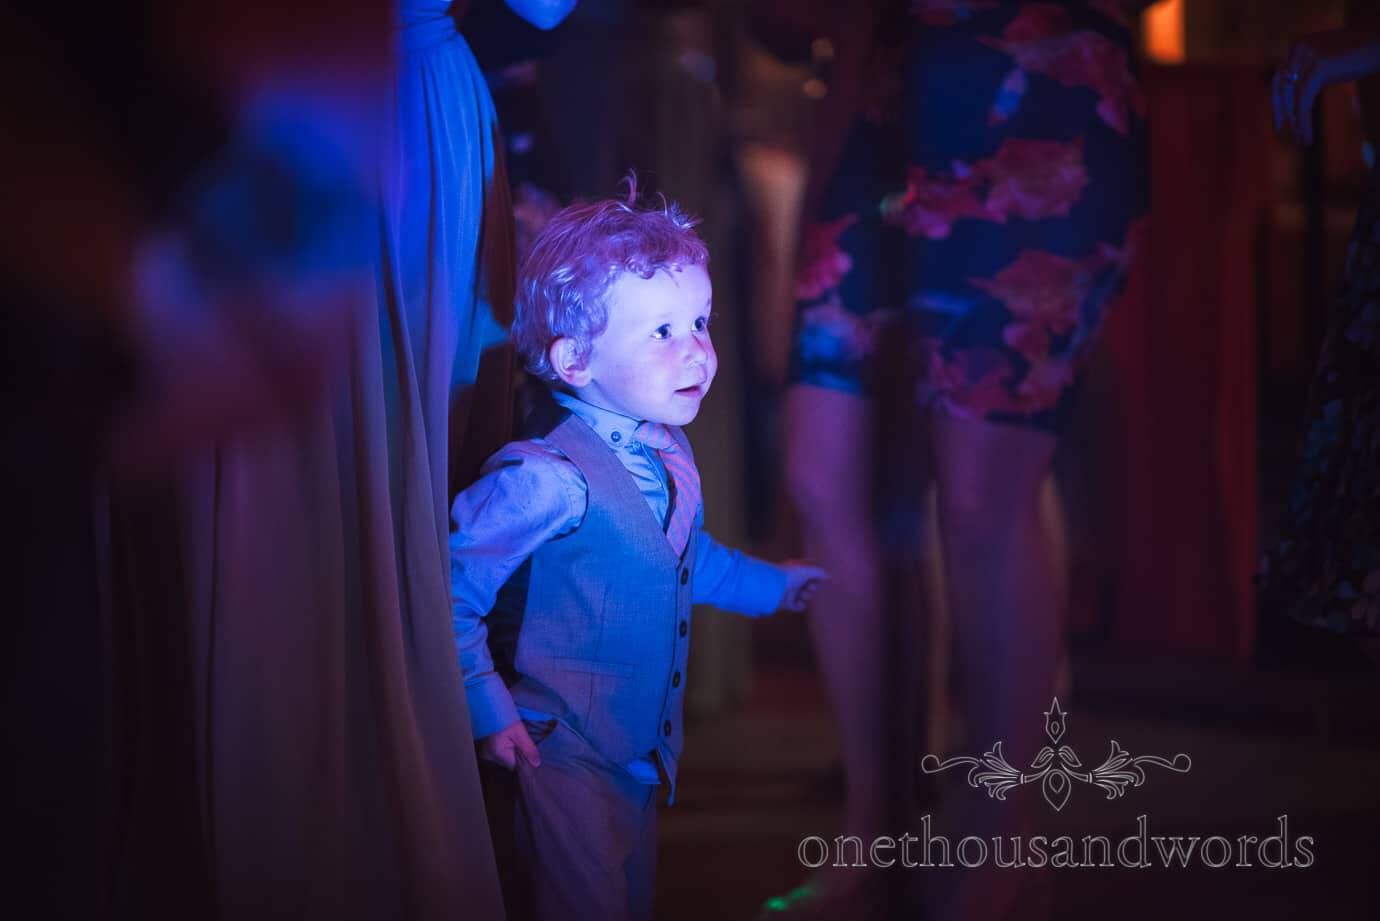 Child wedding guest dances under blue disco lights on the dance floor at Barn wedding